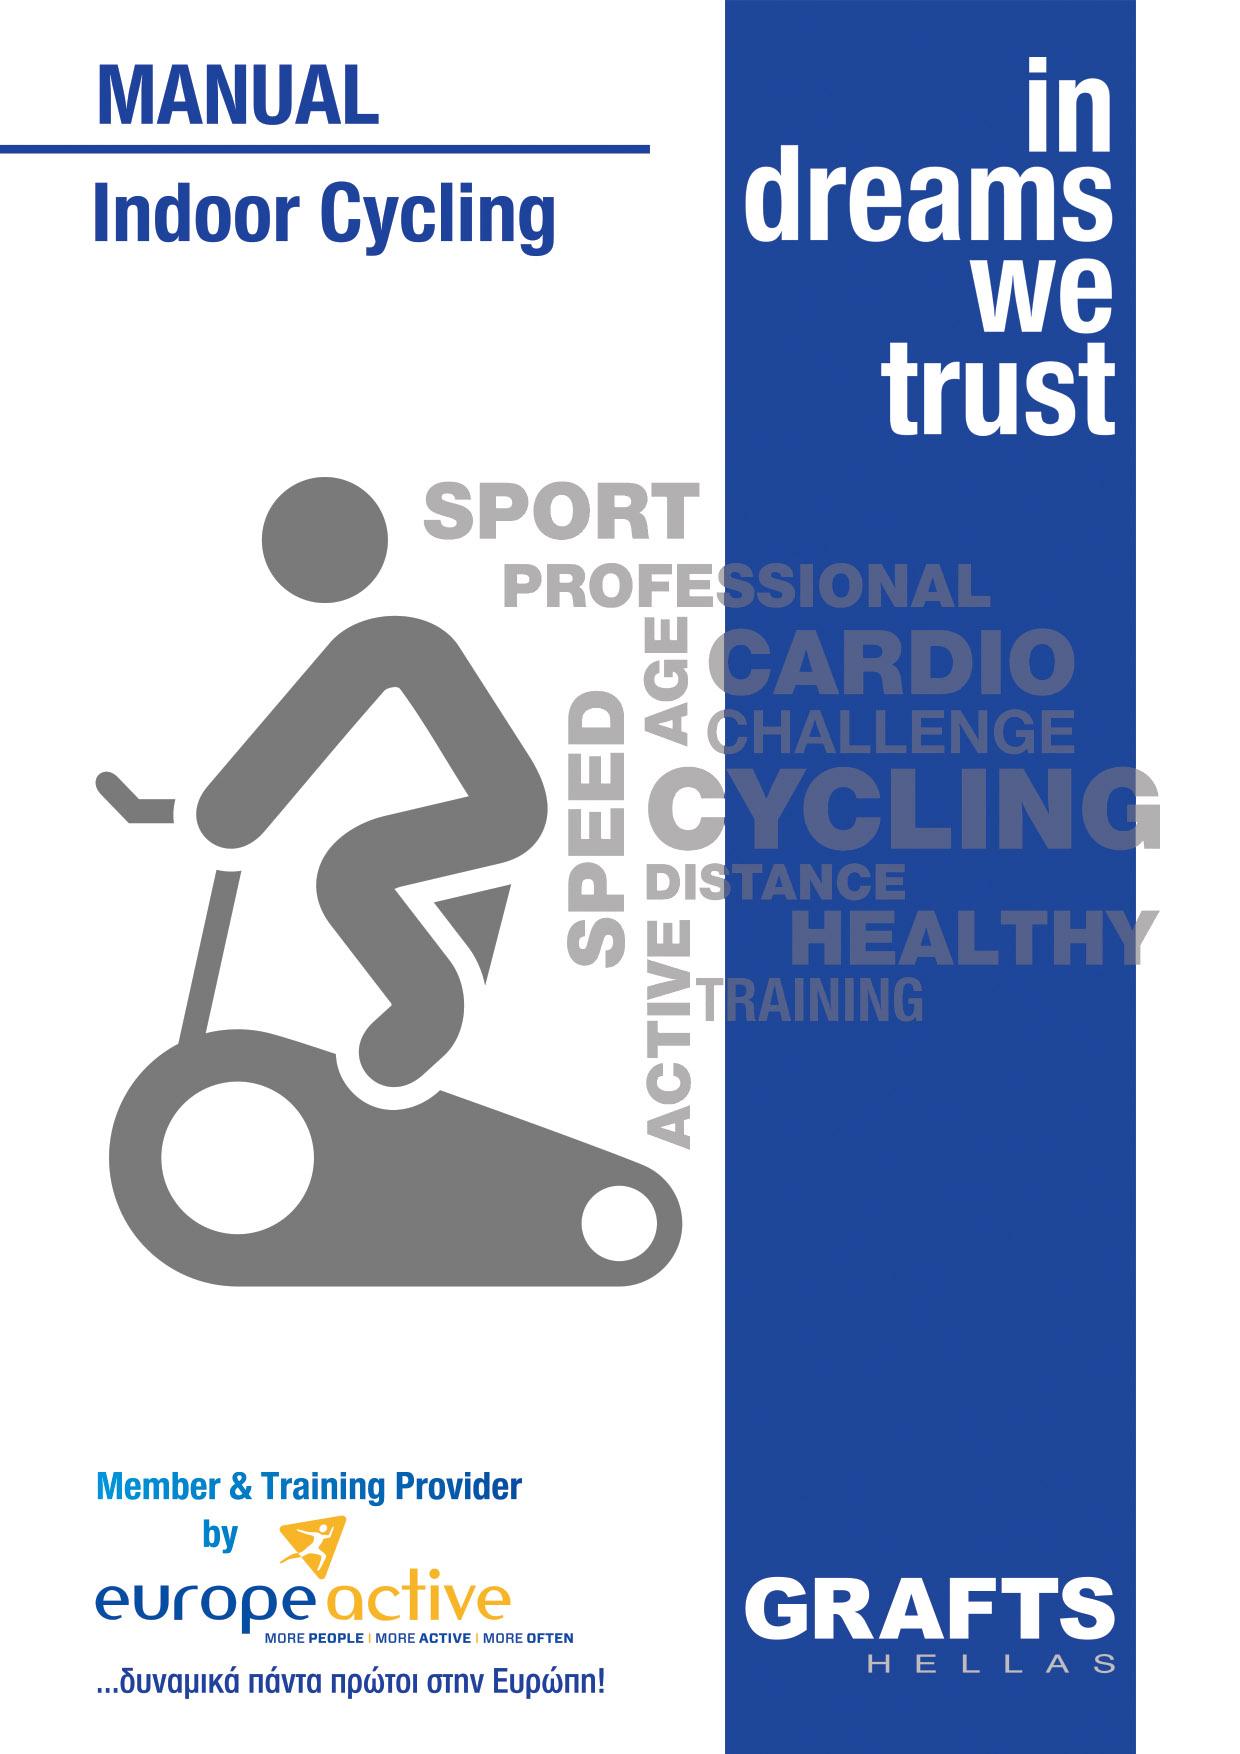 Grafts Hellas - Indoor Cycling workshop